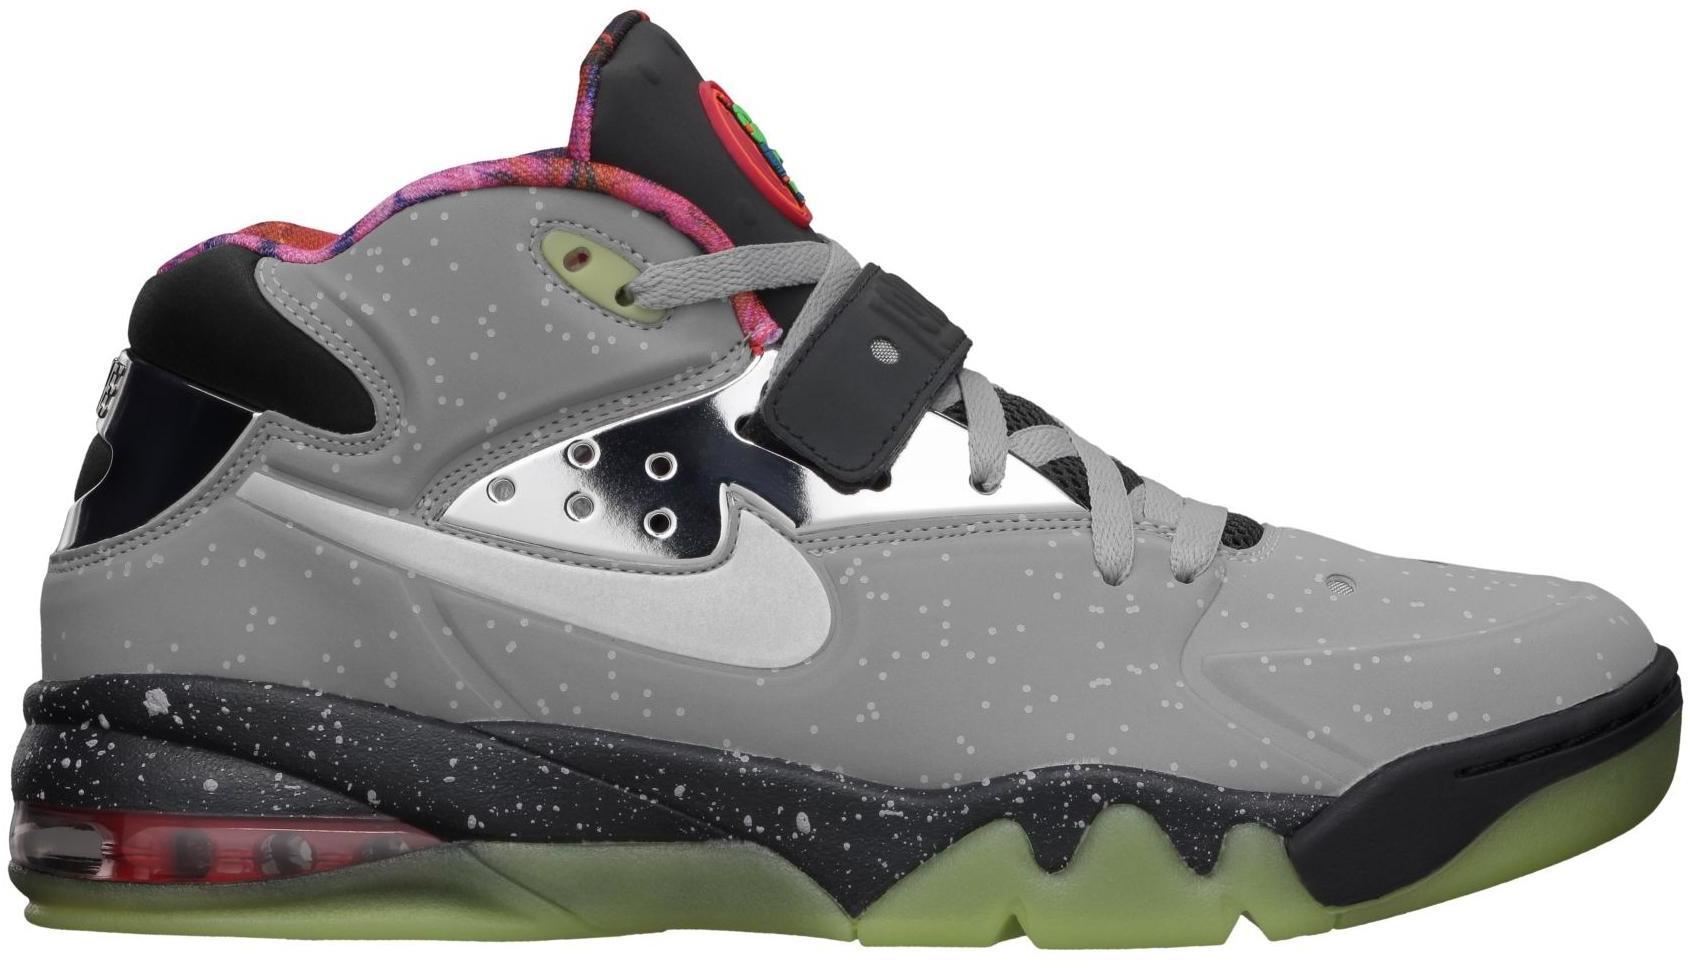 Barkley Basketball Chaussures Buy Nike Deadstock amp; Sneakers wSH5zEqa